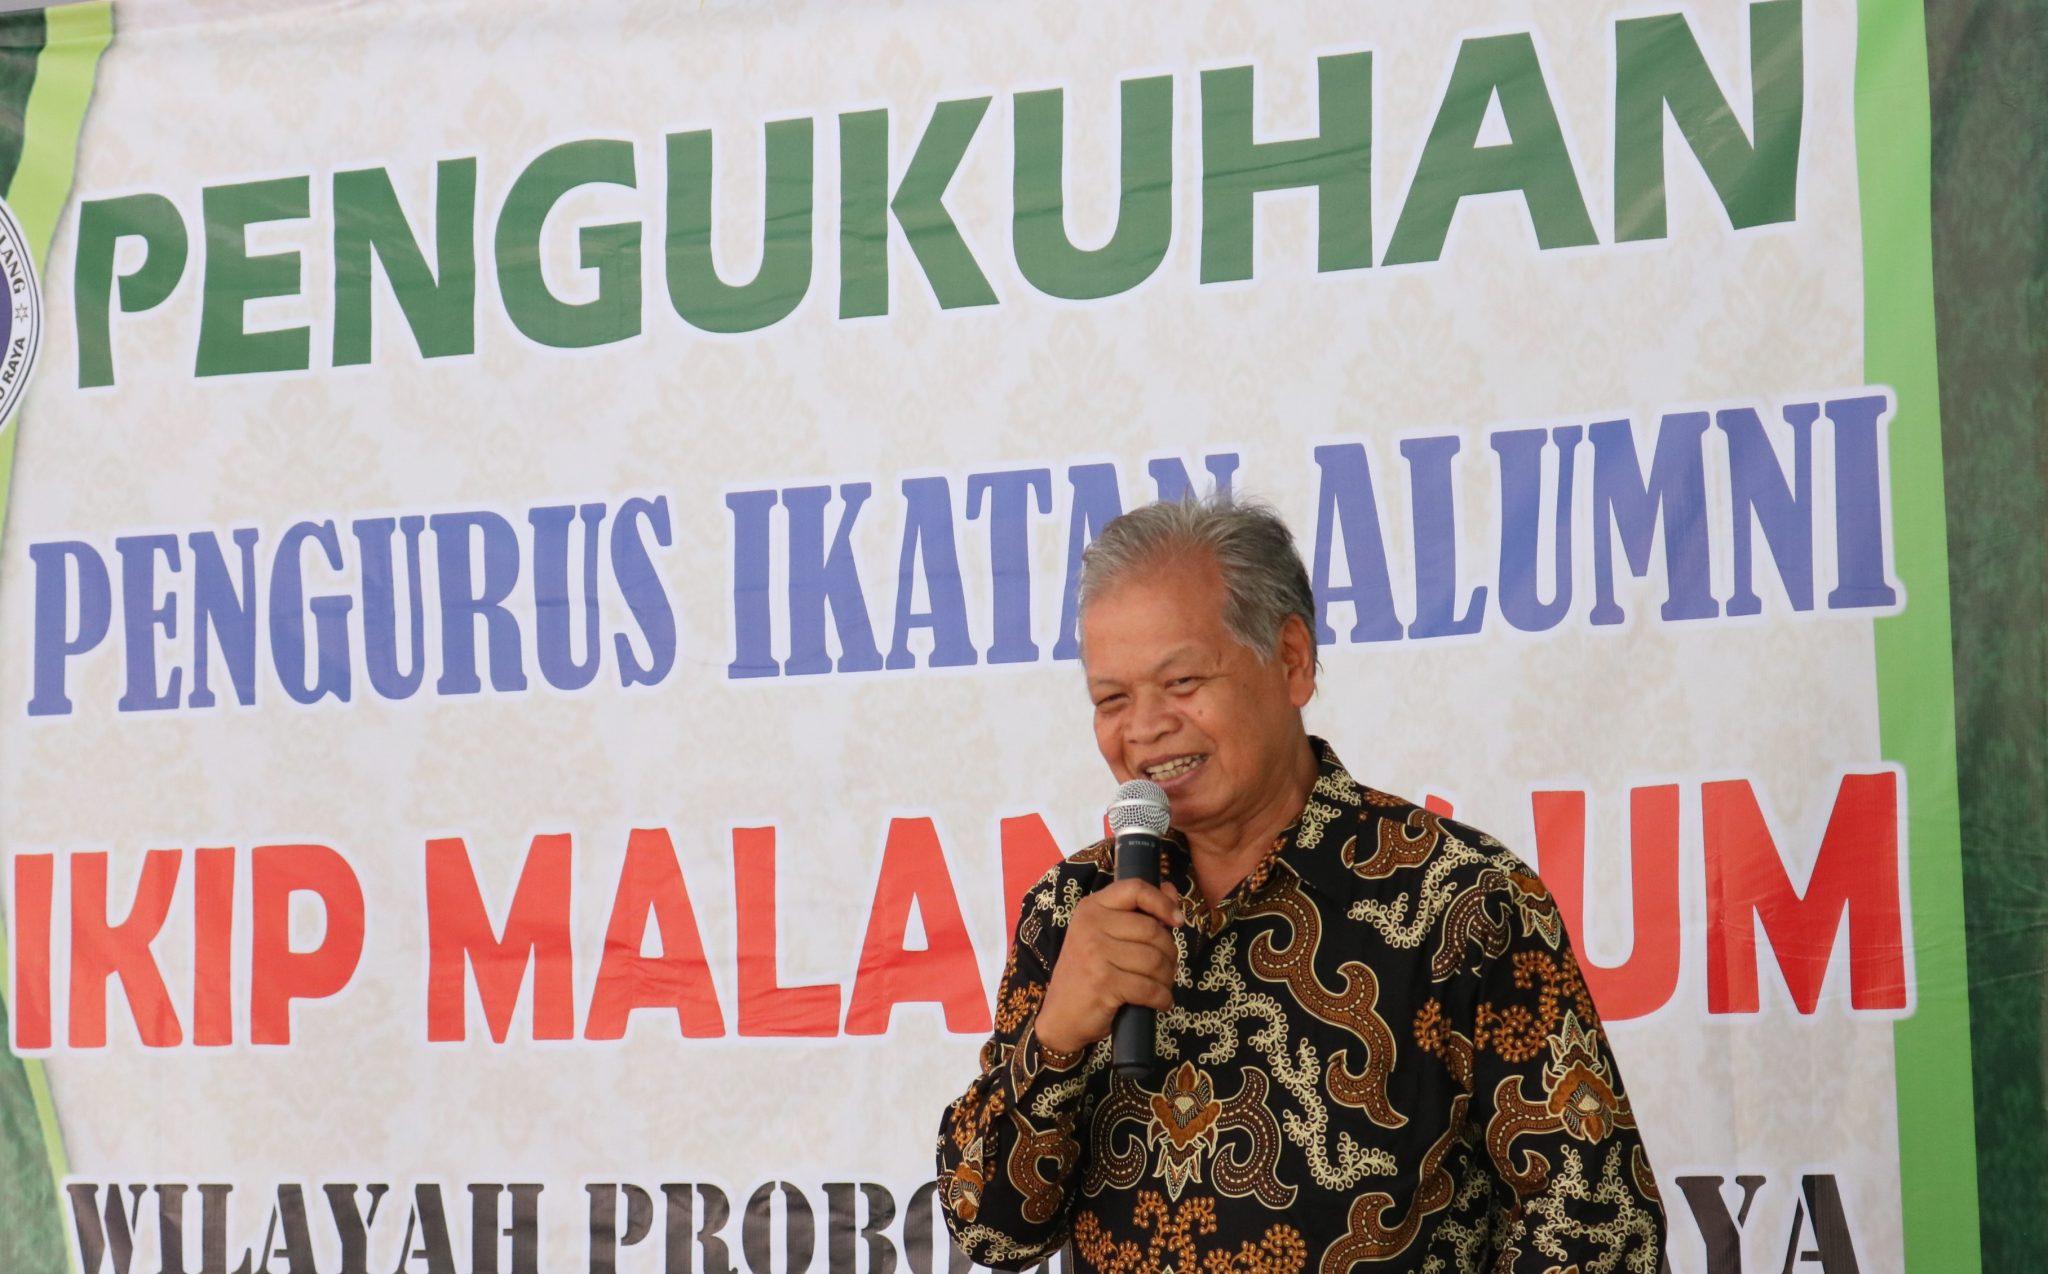 Pak Suparno-Pengukuhan IKA Probolinggo